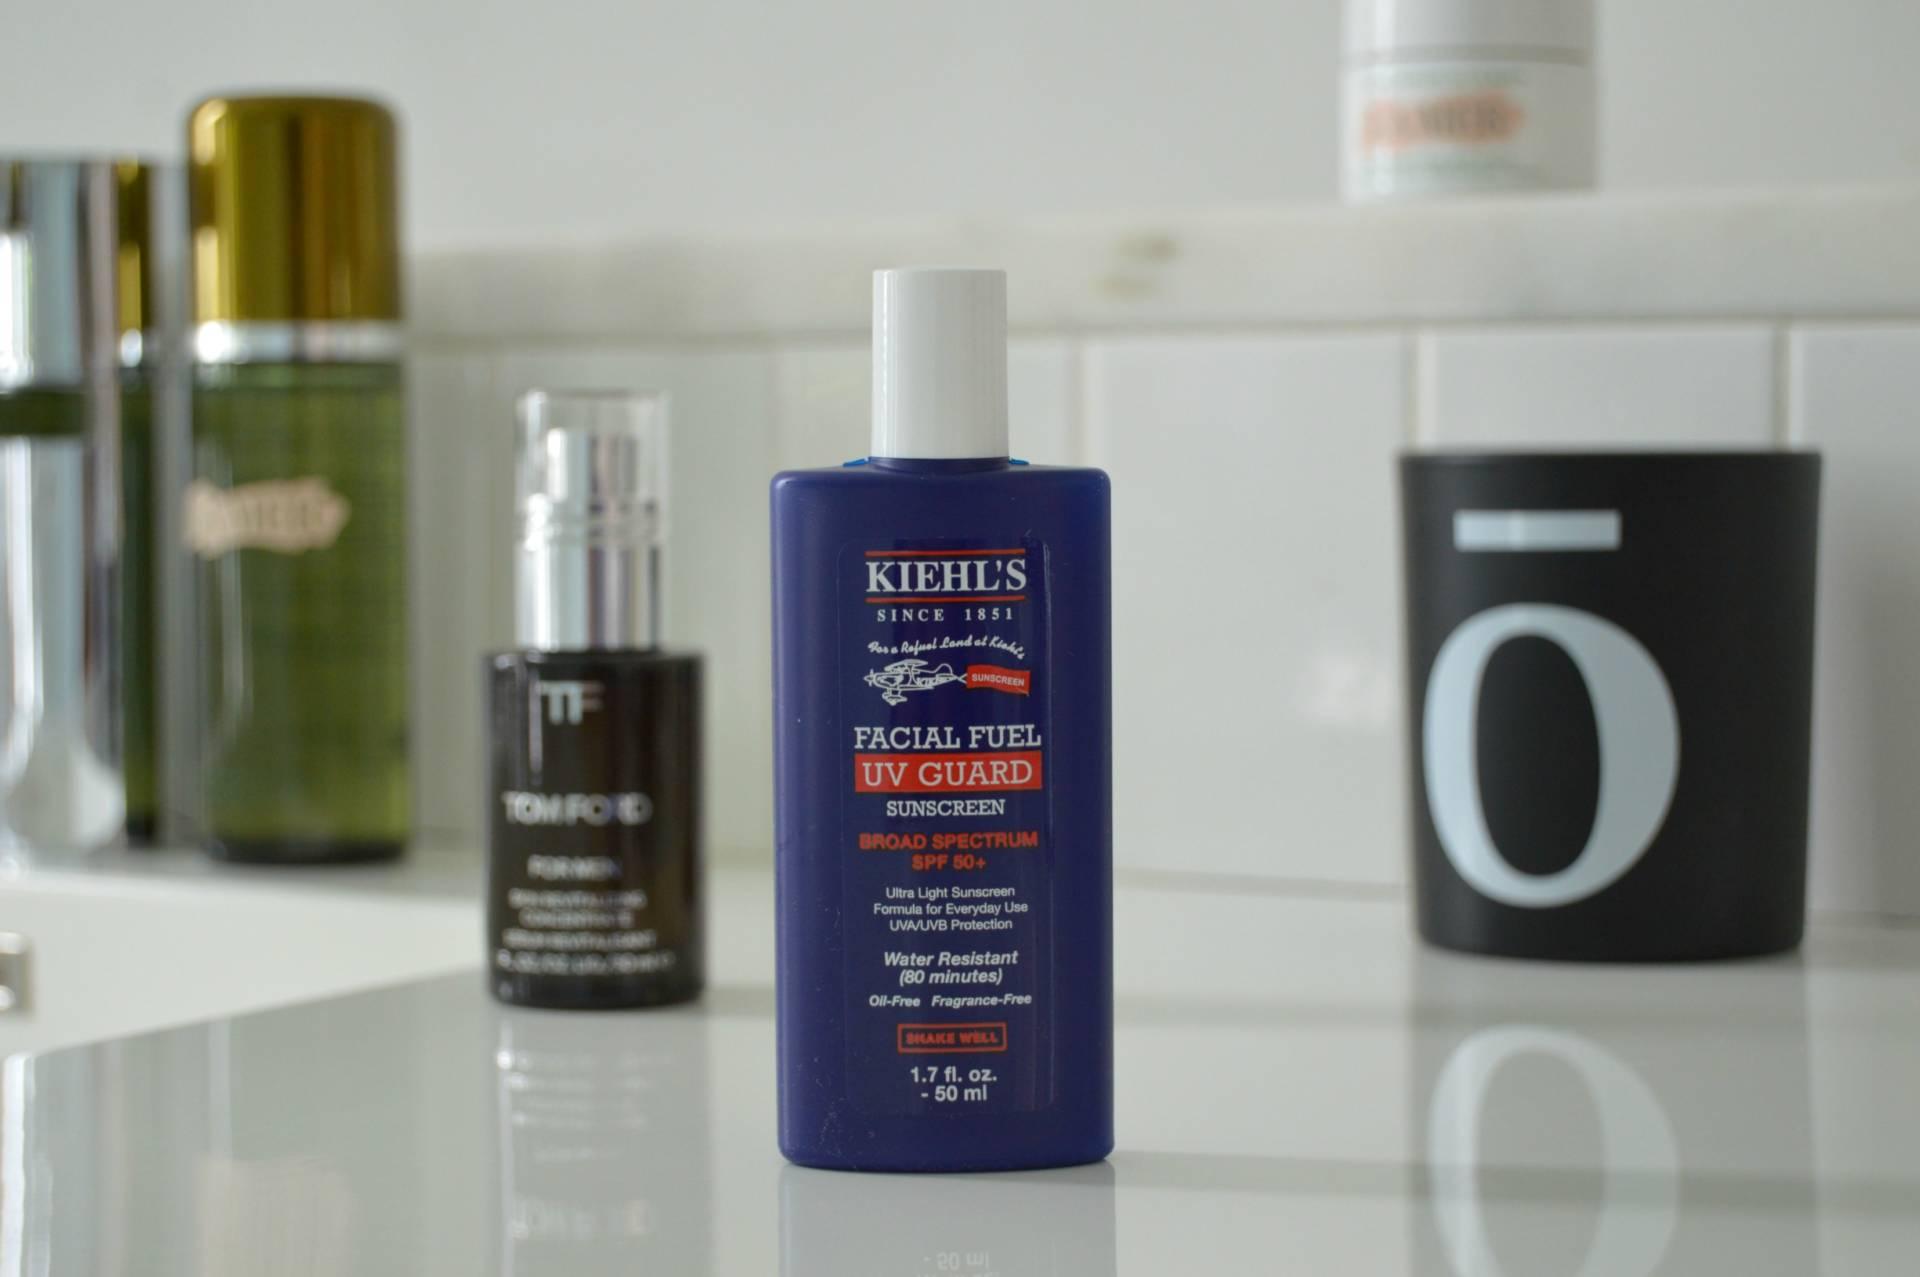 kiehls facial fuel sunscreen spf 50 for men neiman marcus inhautepursuit review